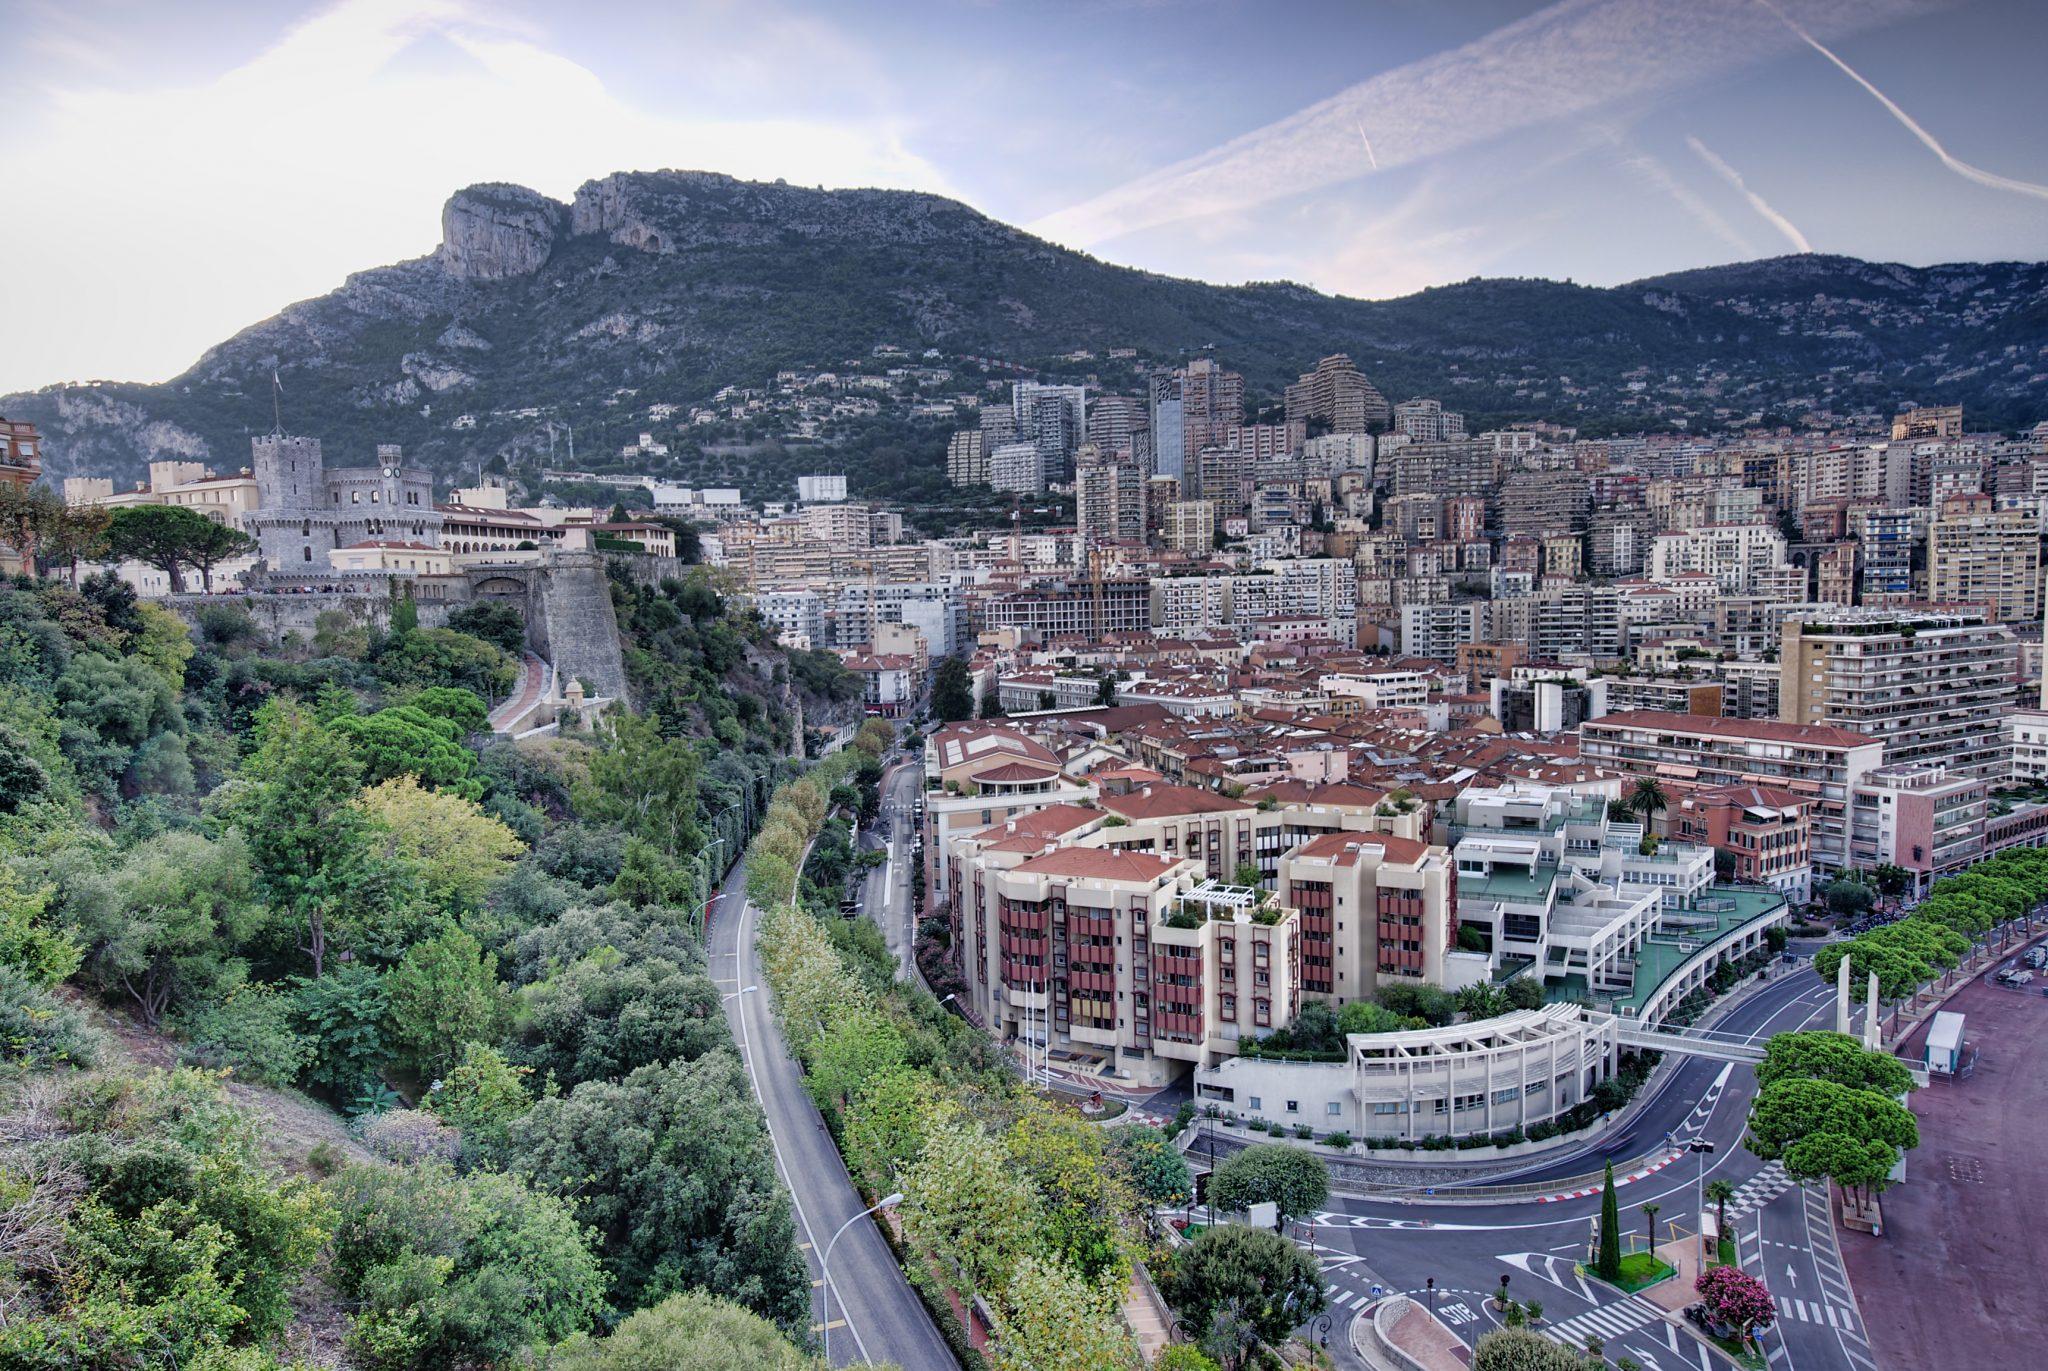 Formule 1 circuit Monaco